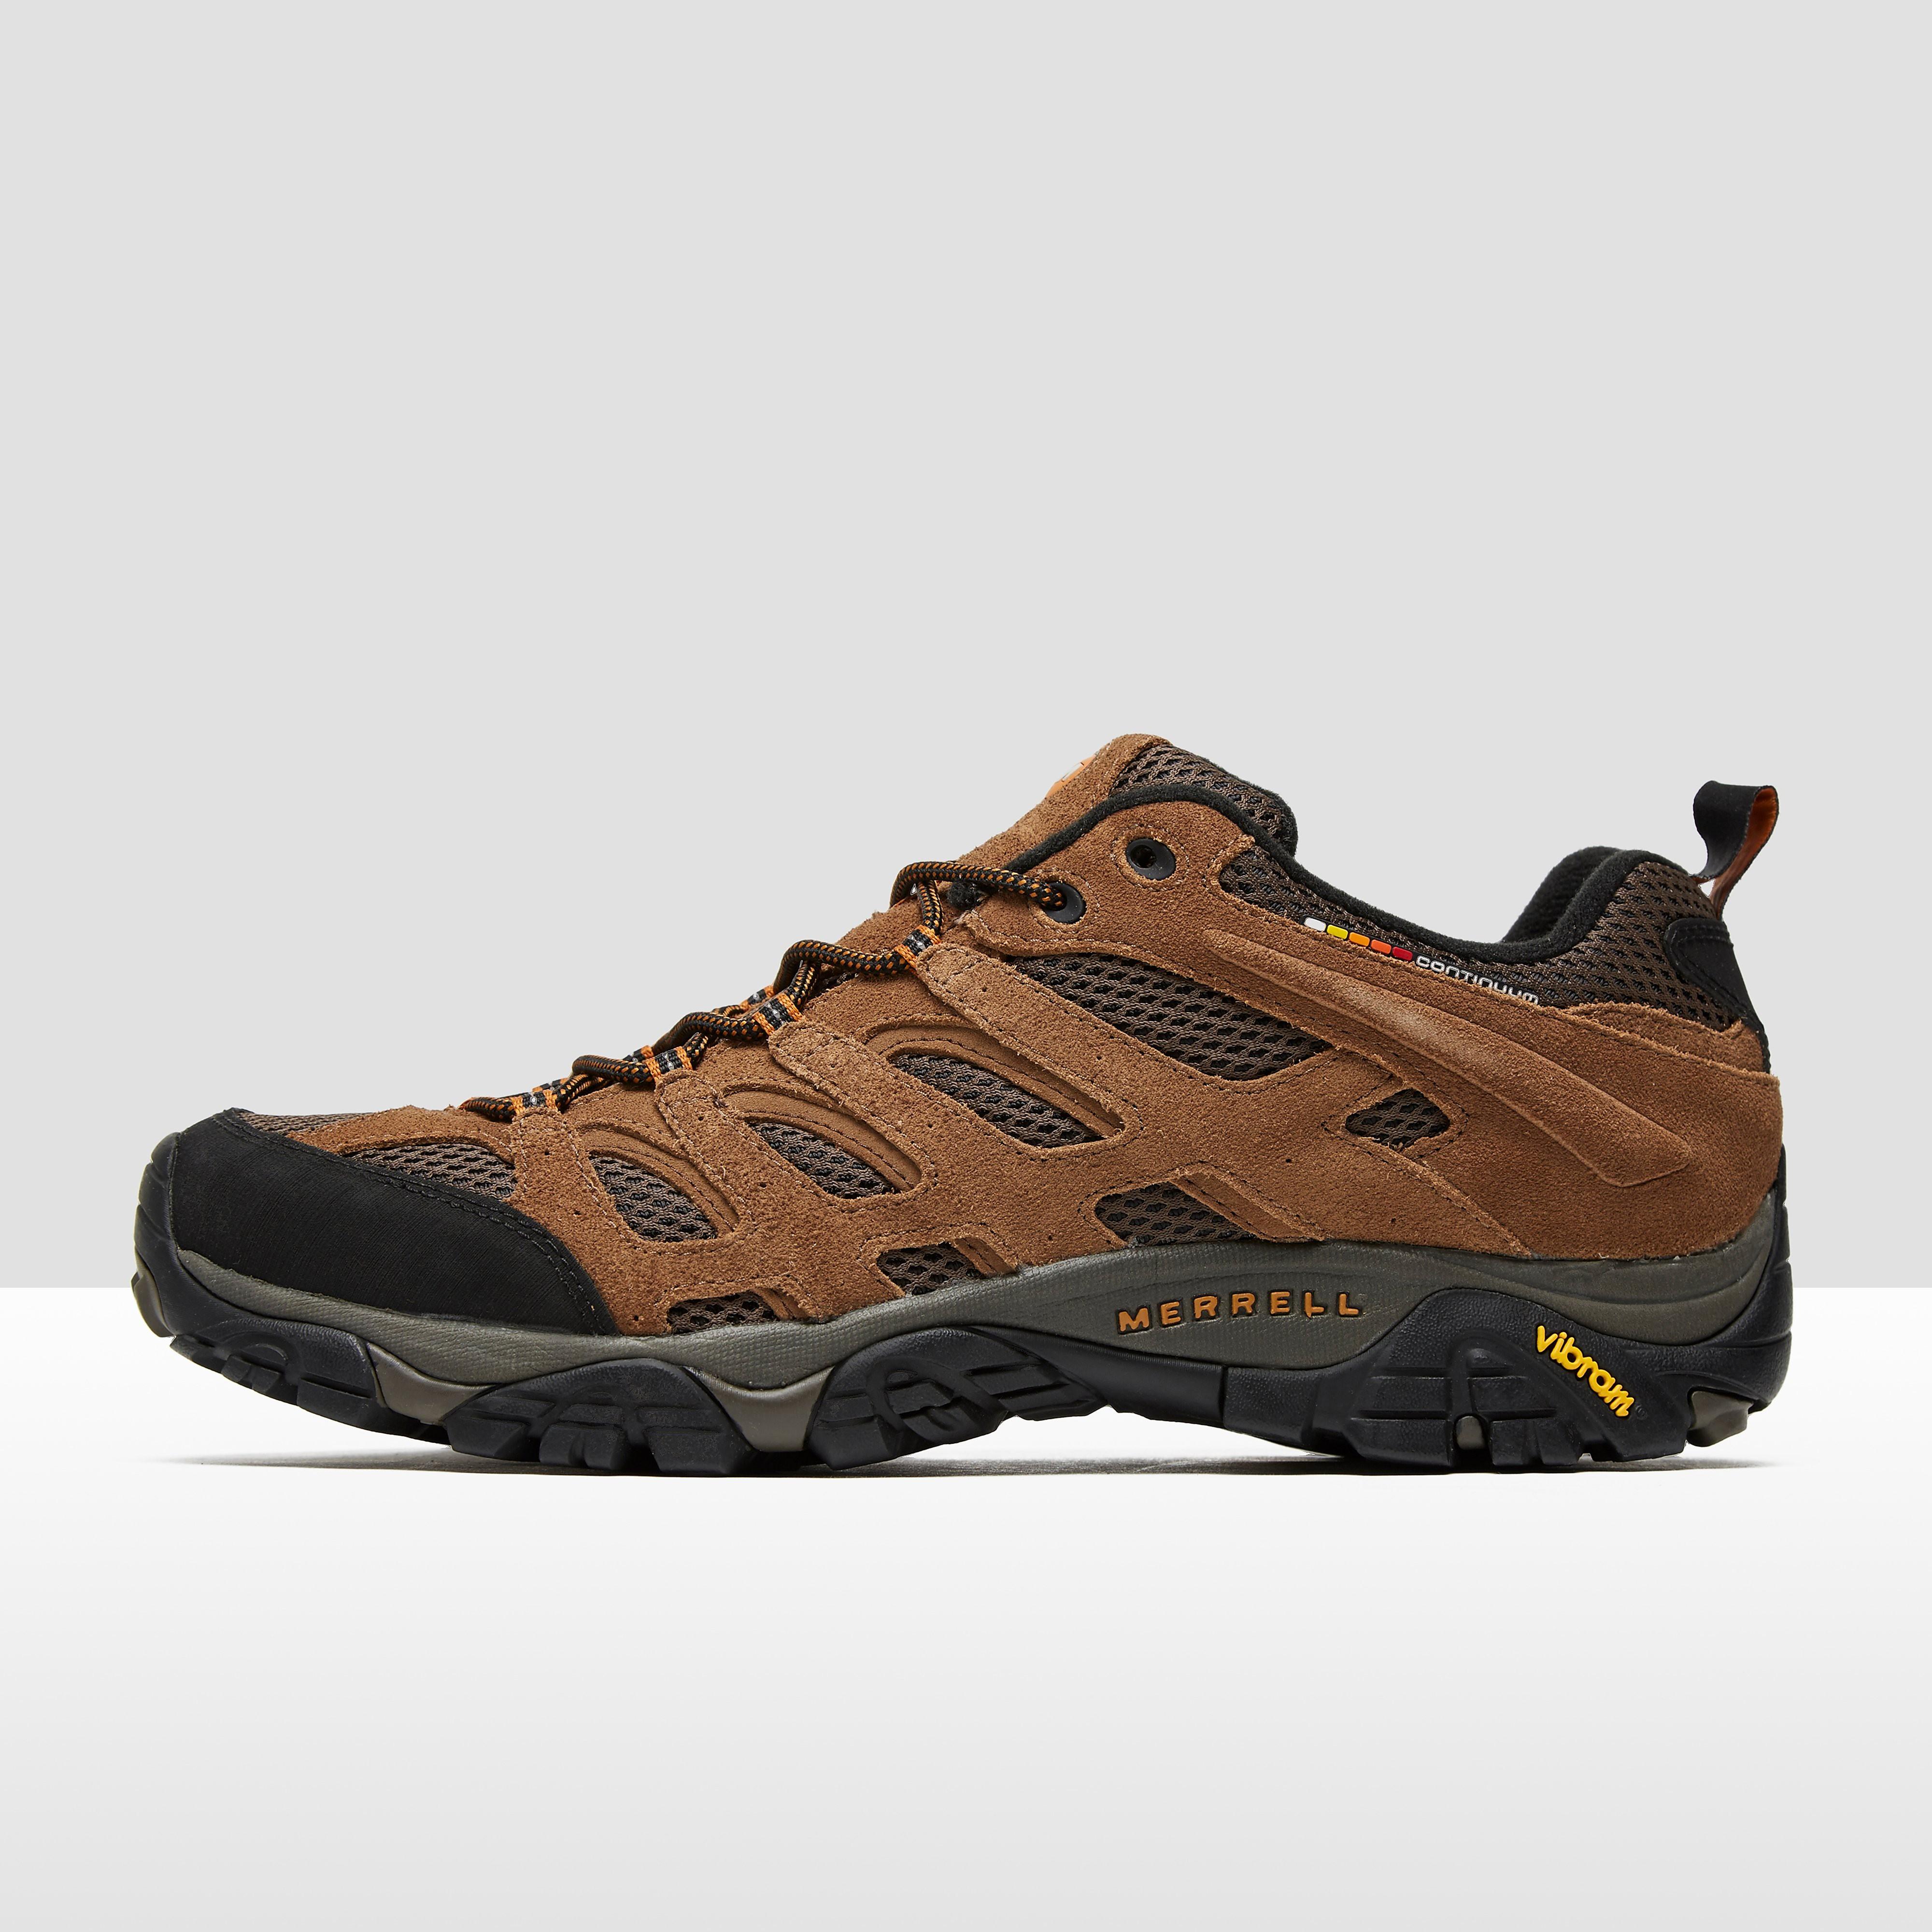 Merrell Moab Ventilator Men's Walking Shoes